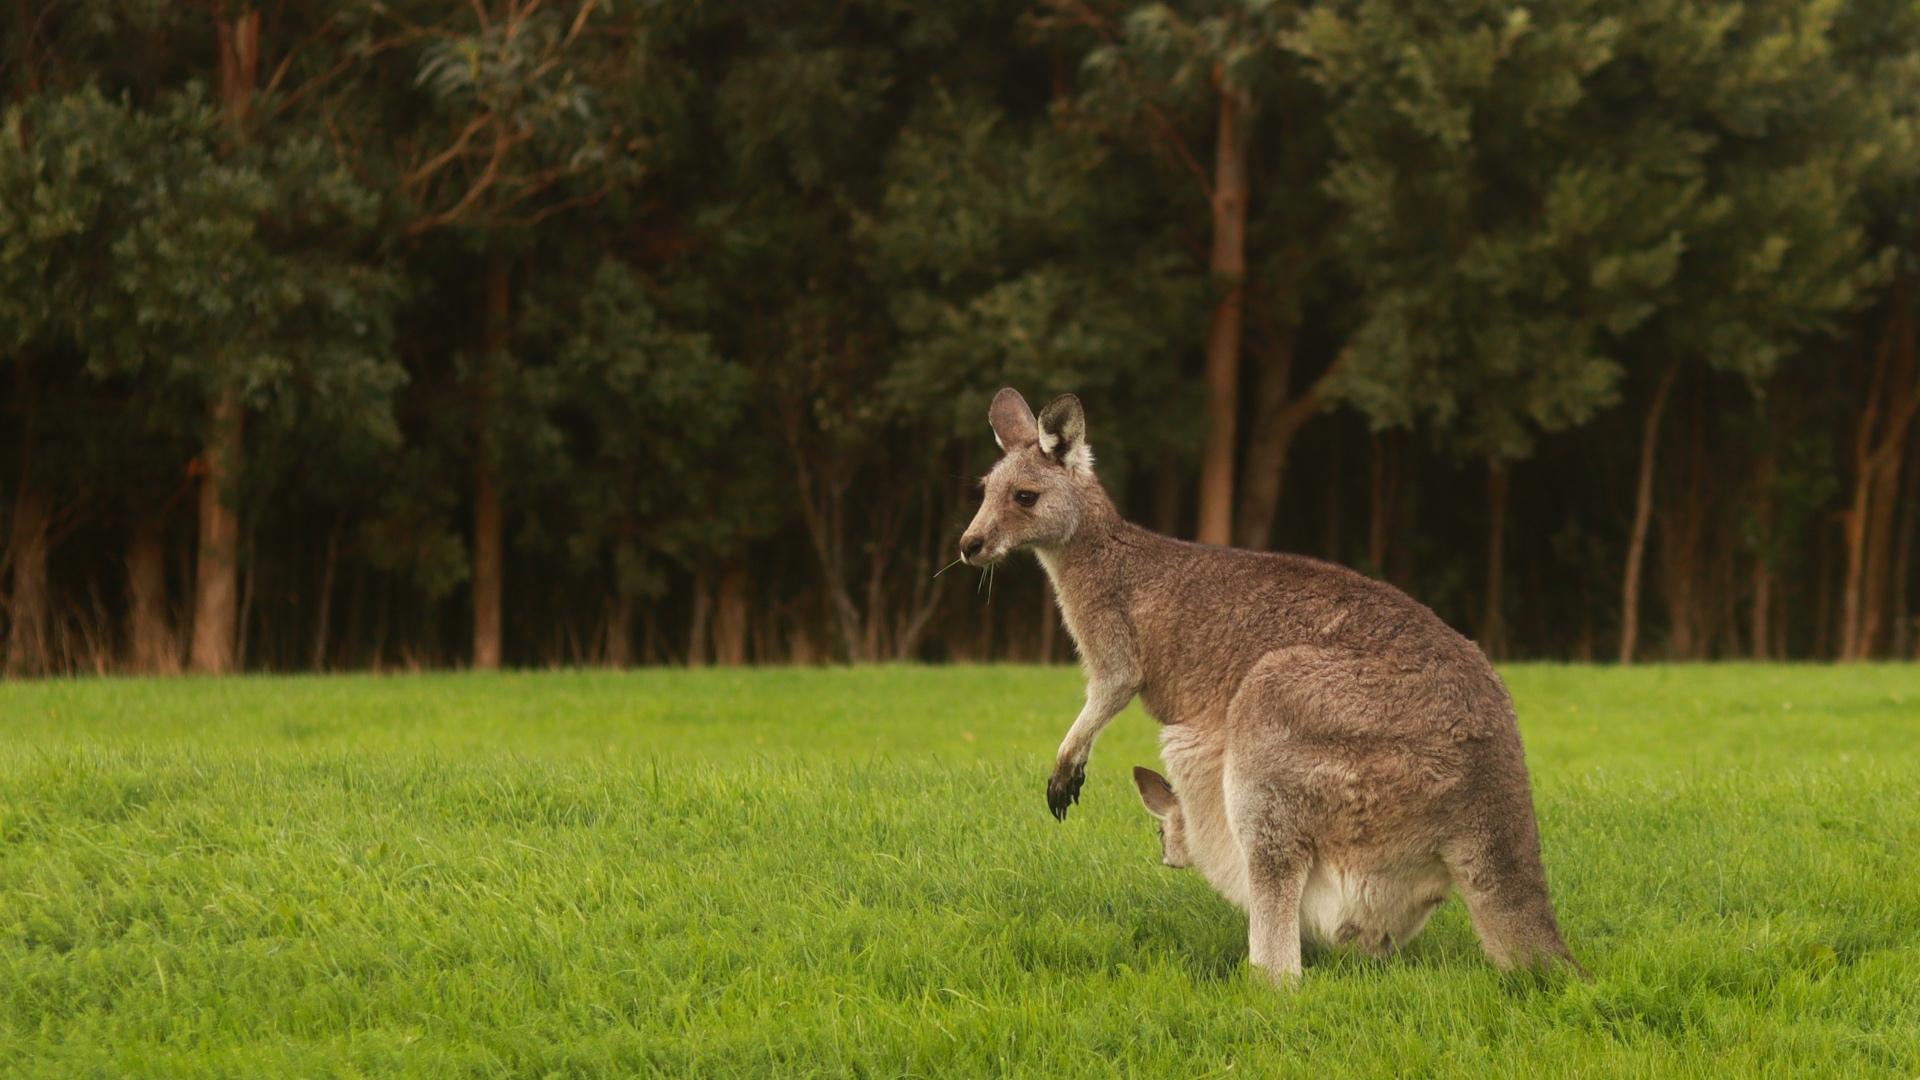 Studio Garden View of Kangaroo